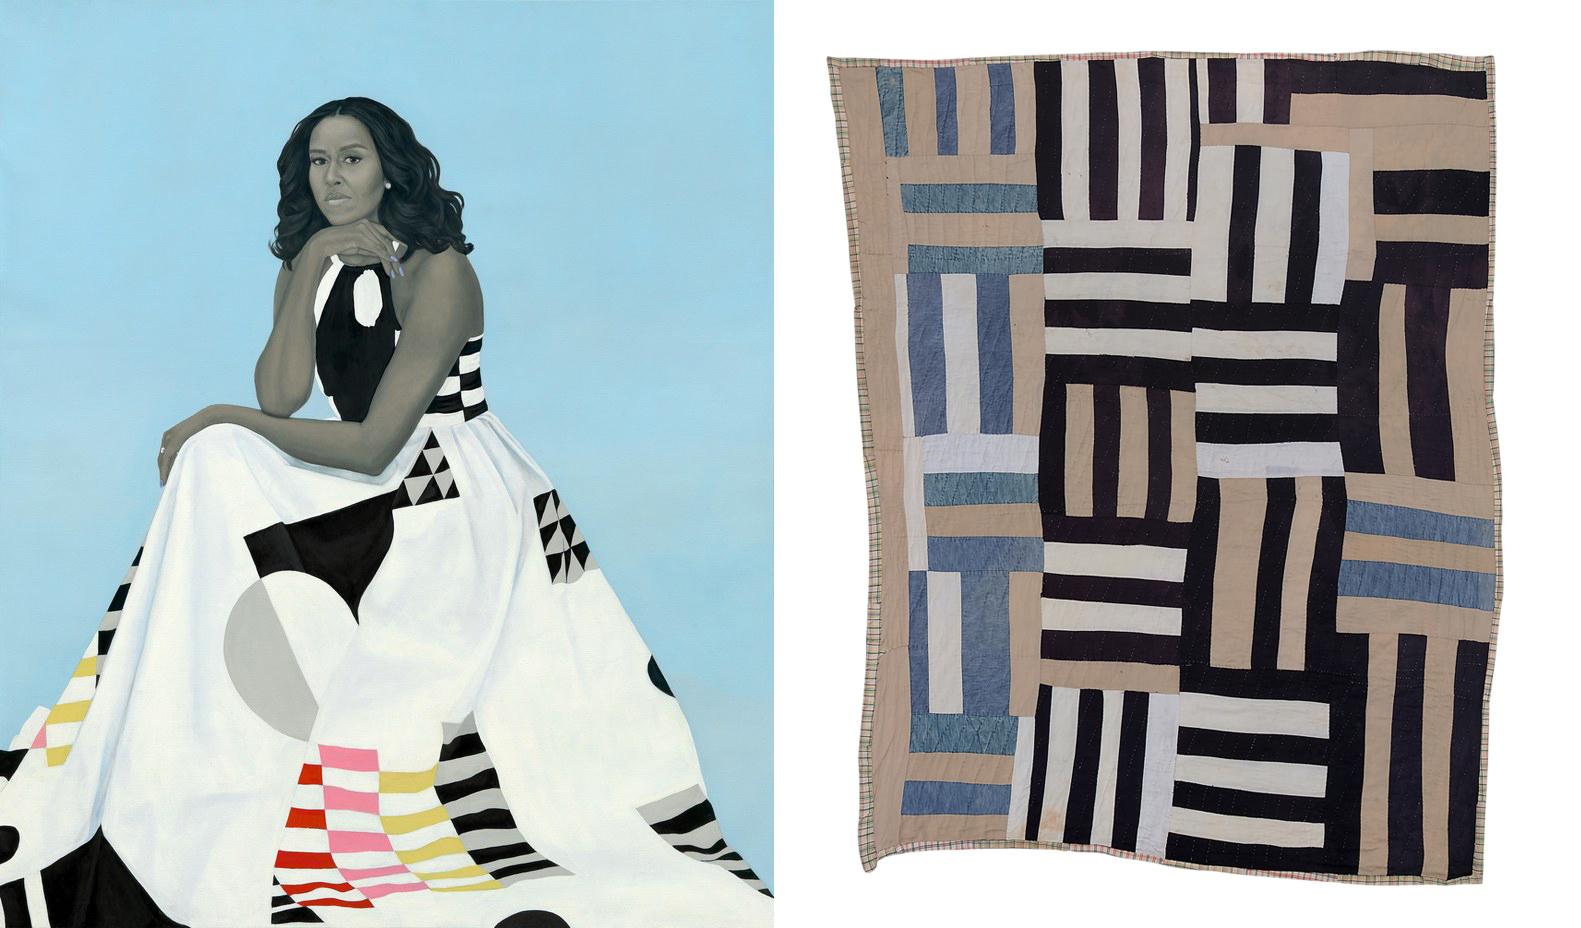 Michelle Obama portrait and quilt by Loretta Pettway